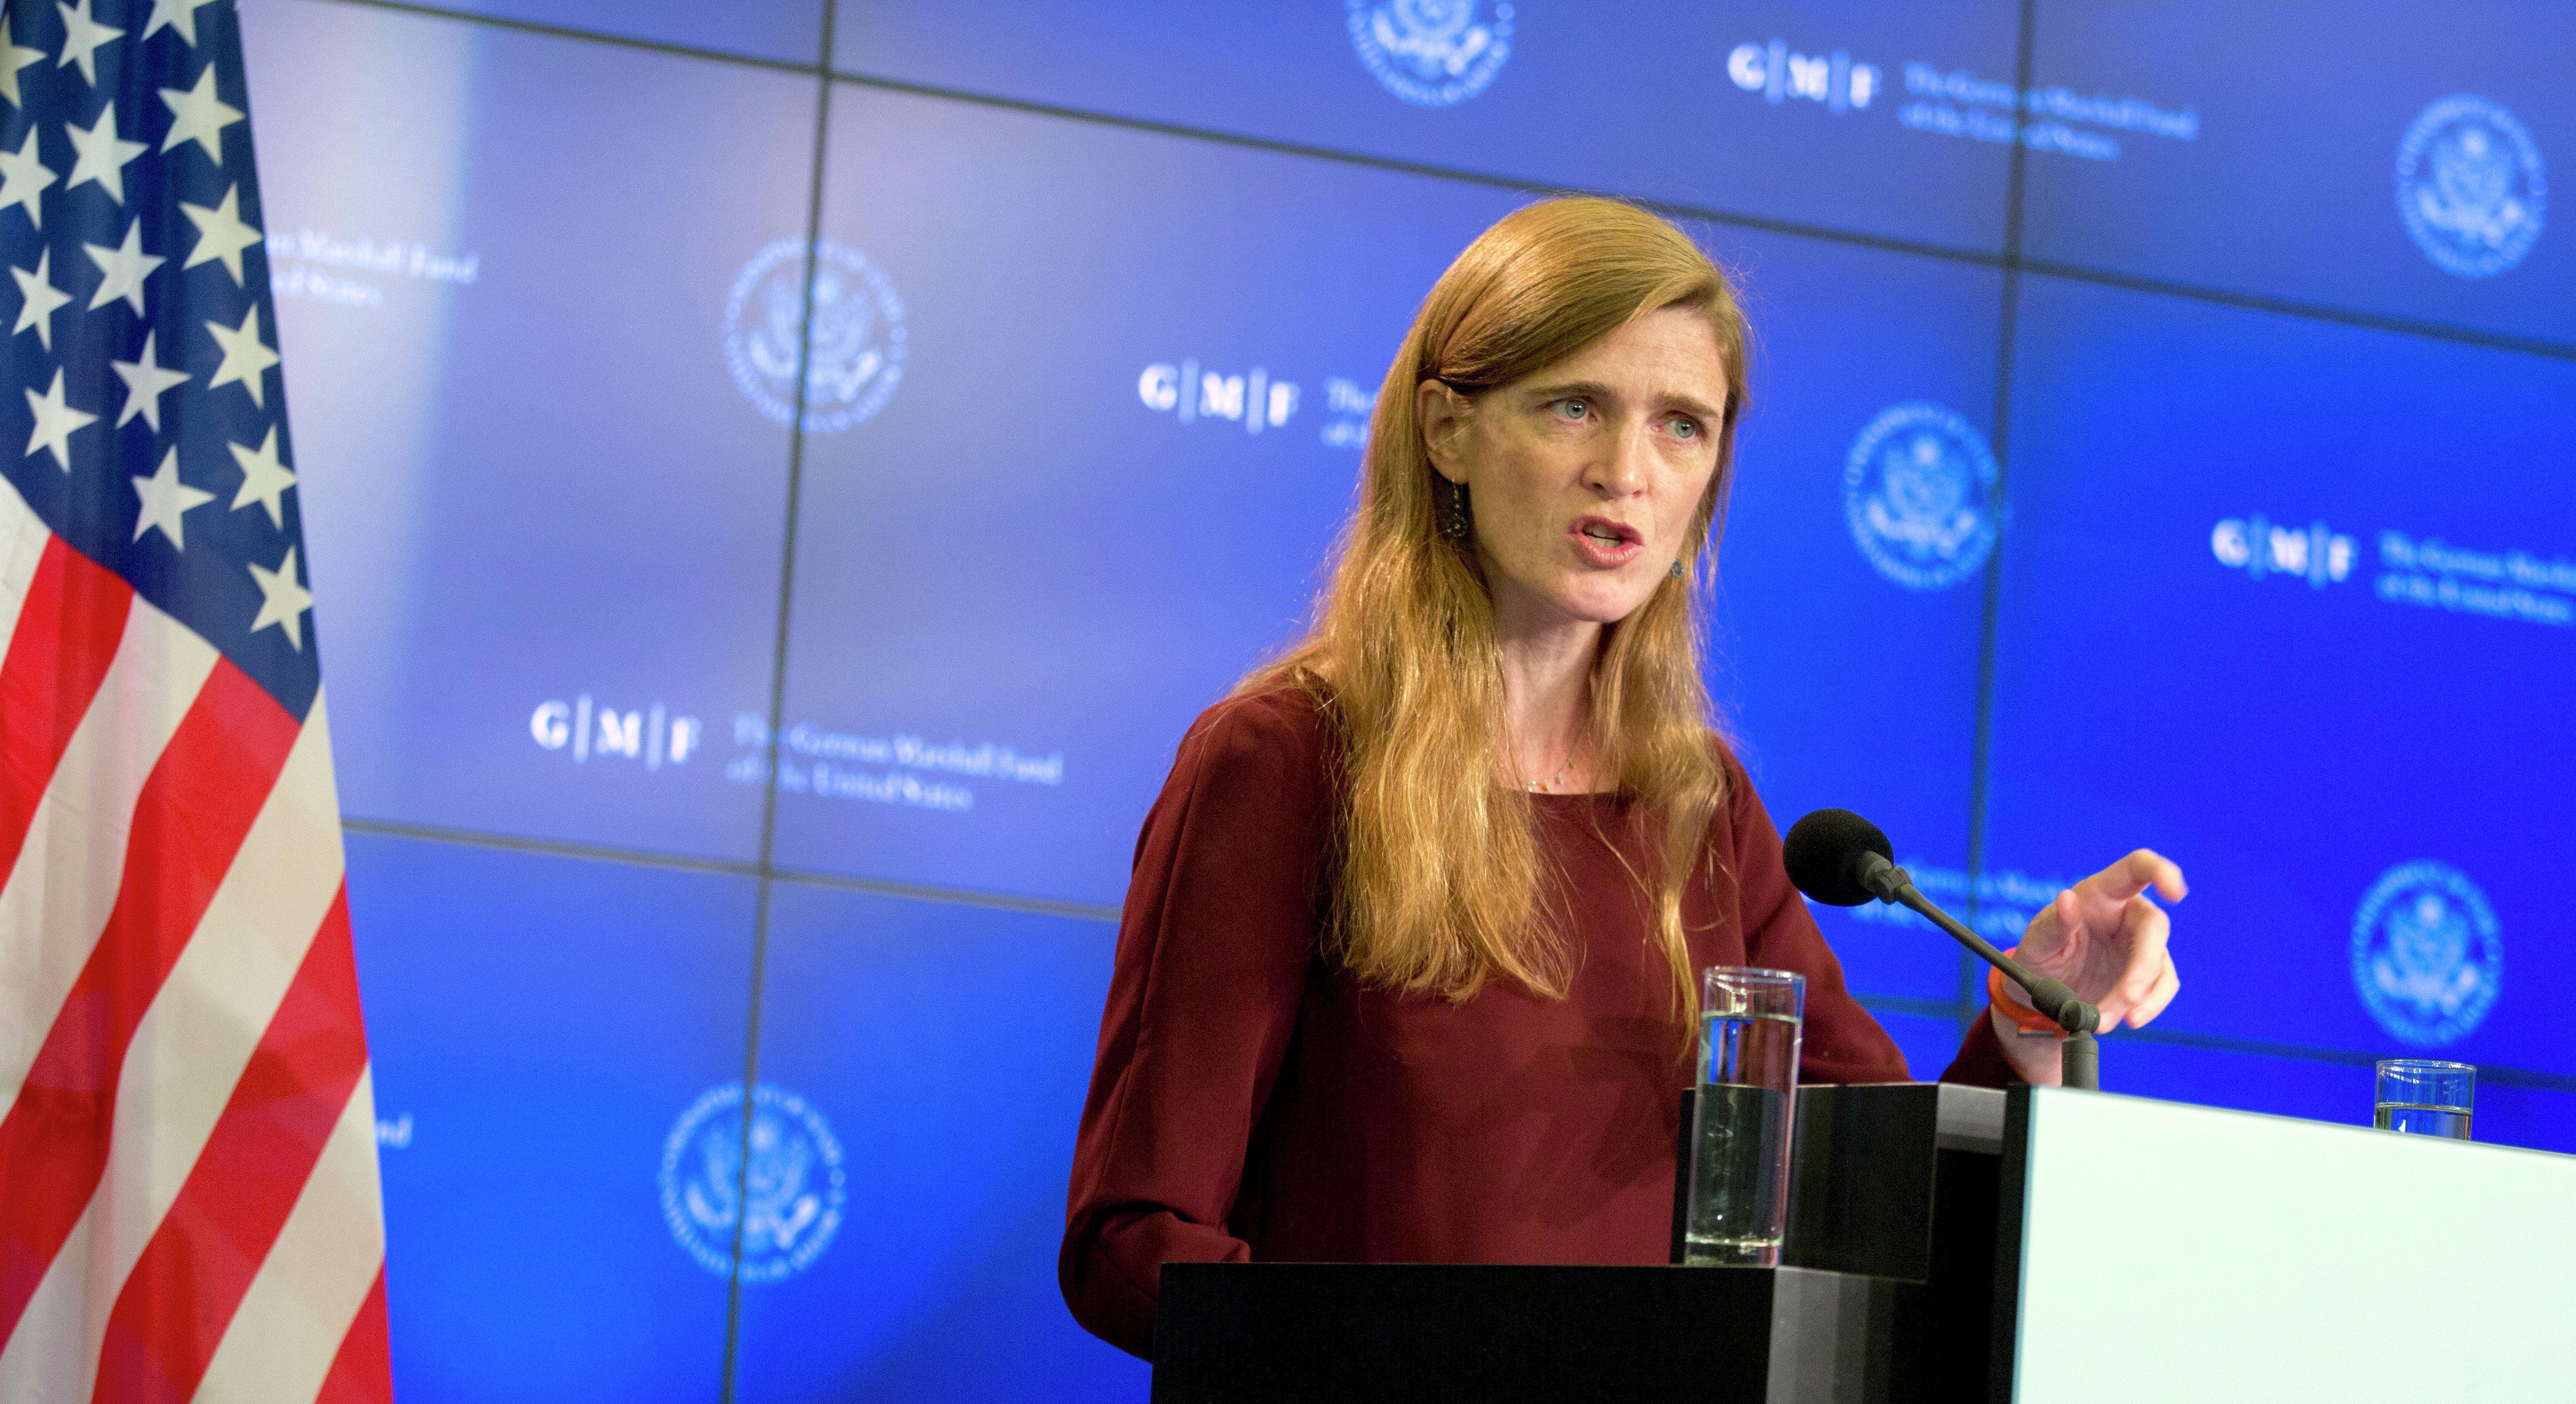 The US Ambassador to the United Nations Samantha Power